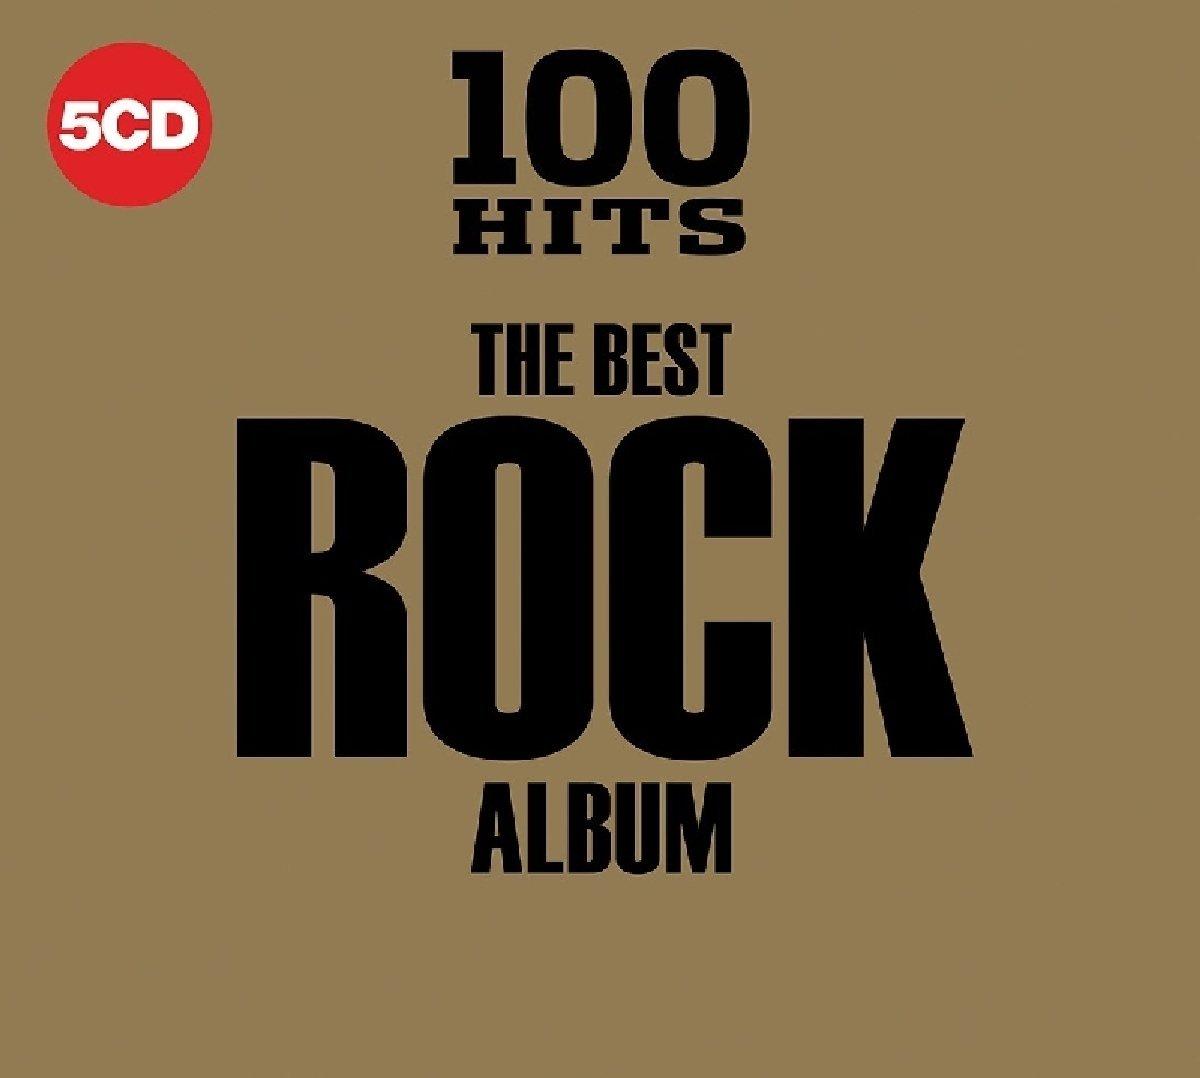 VA - 100 Hits - The Best Rock Album [5CD] (2018)